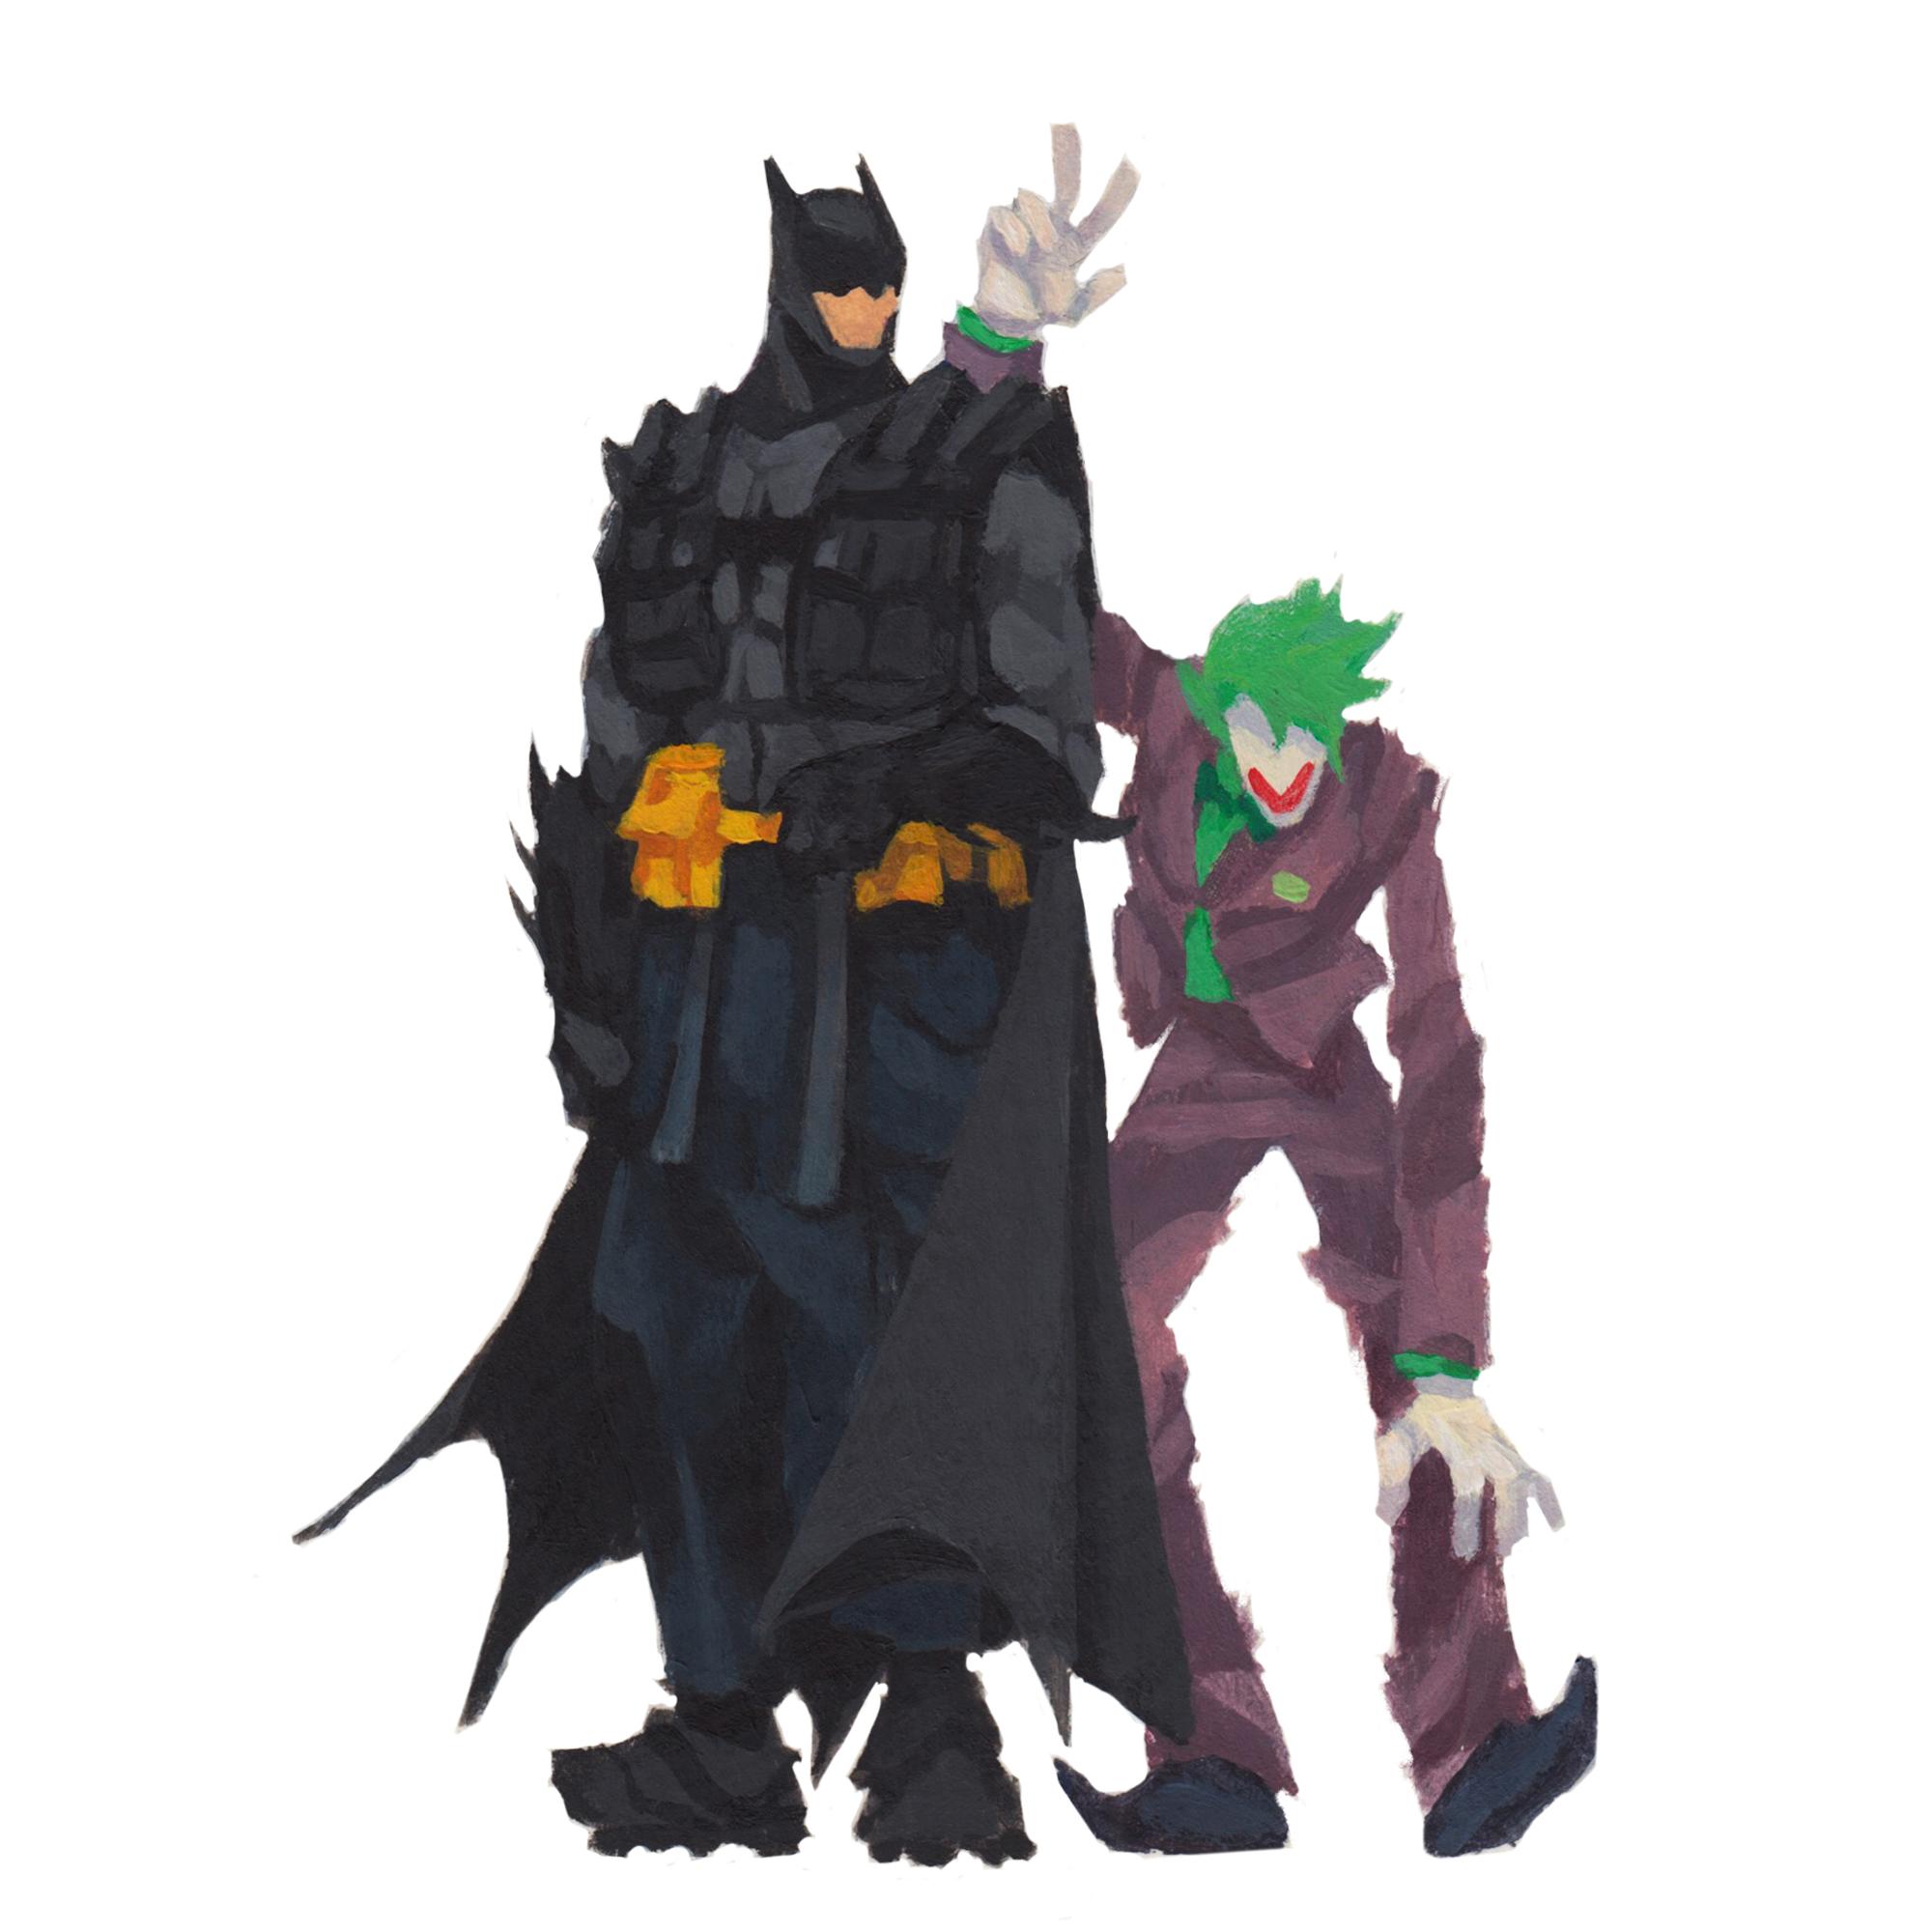 BatmanJoker_001